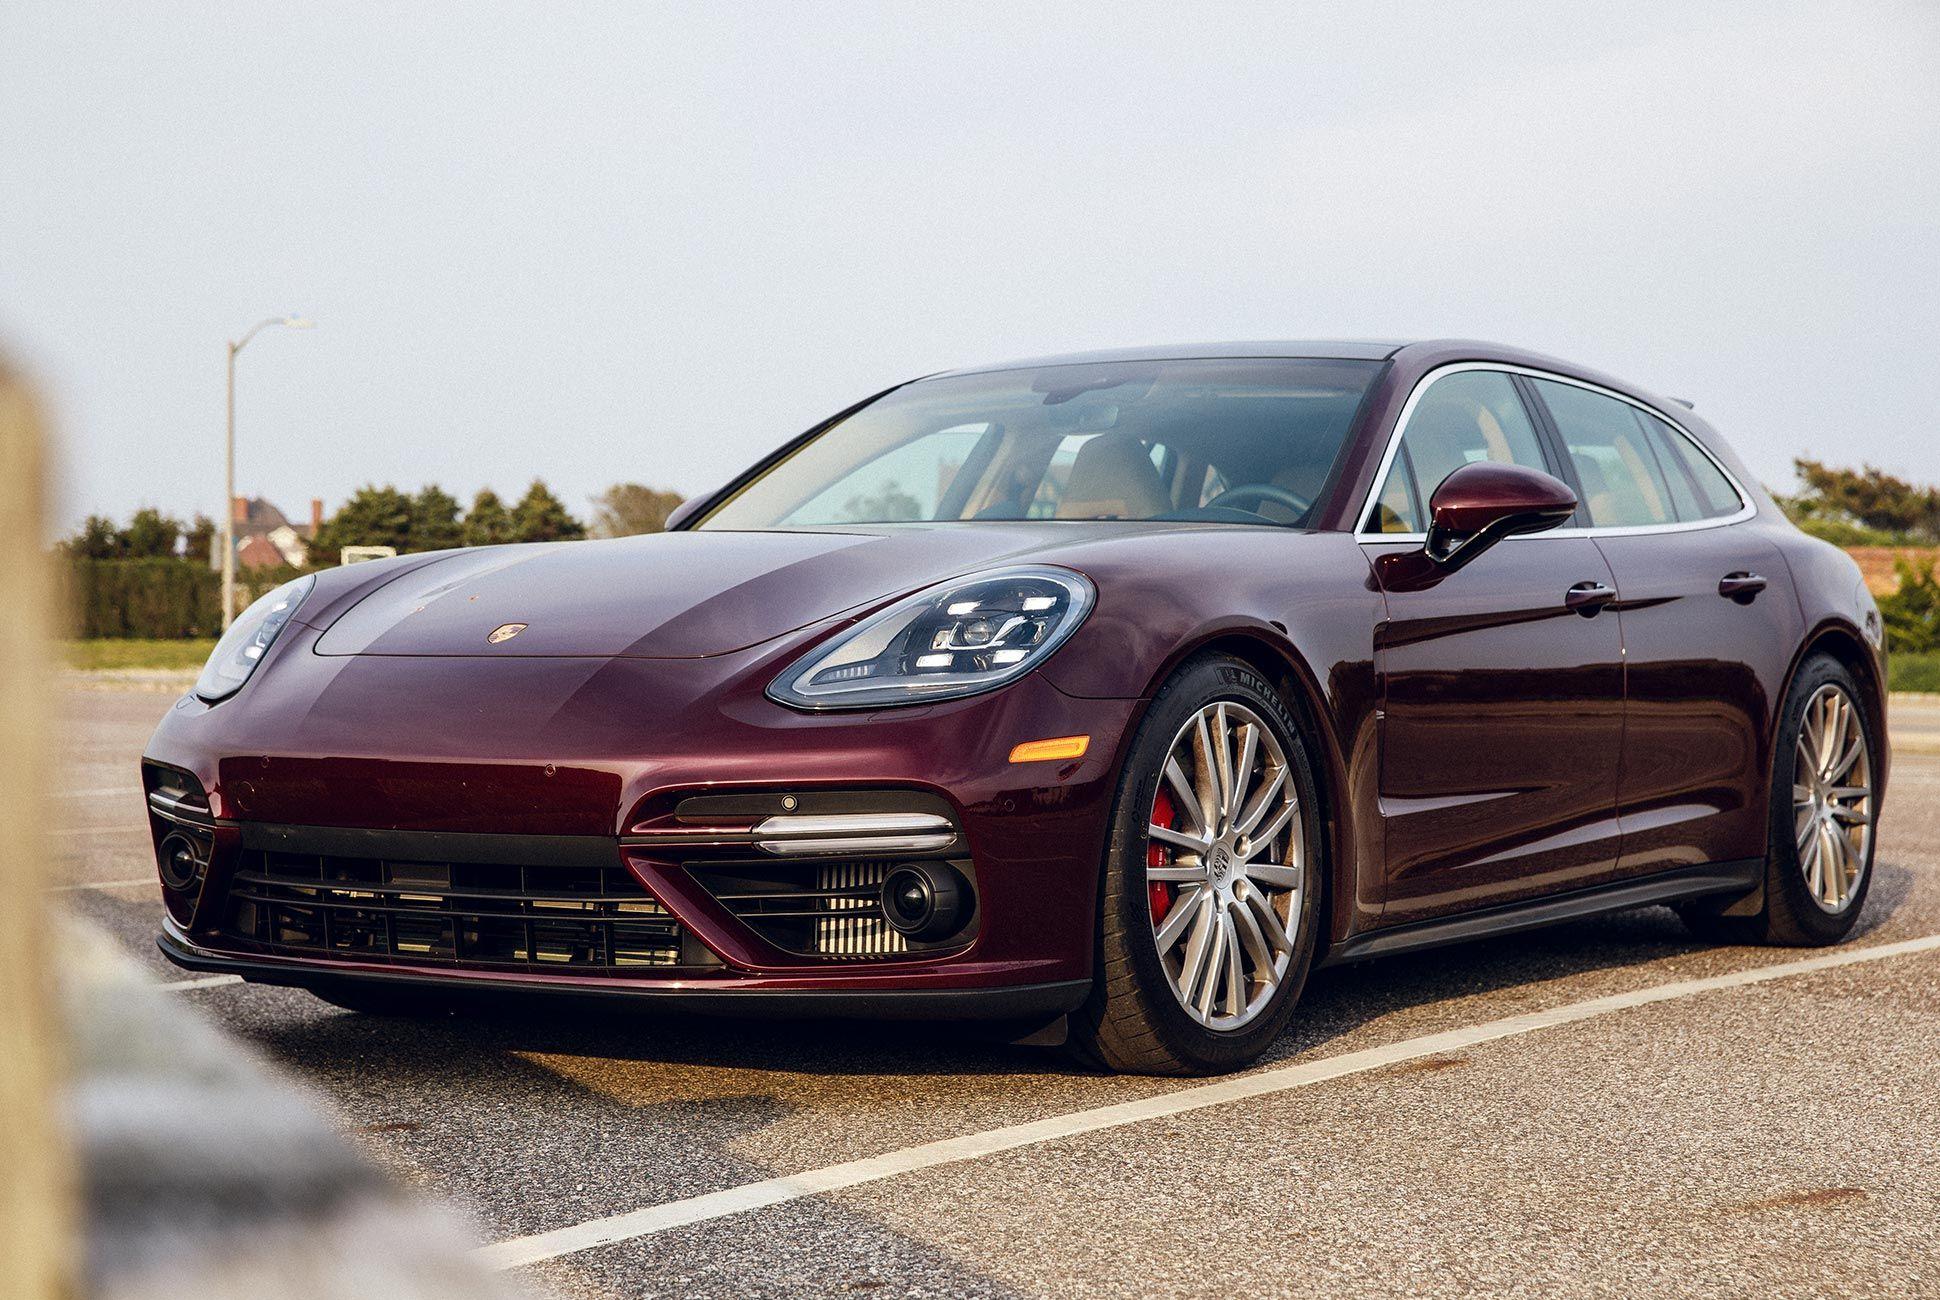 Porsche-Panamera-Turbo-Sport-Turismo-Review-gear-patrol-slide-4